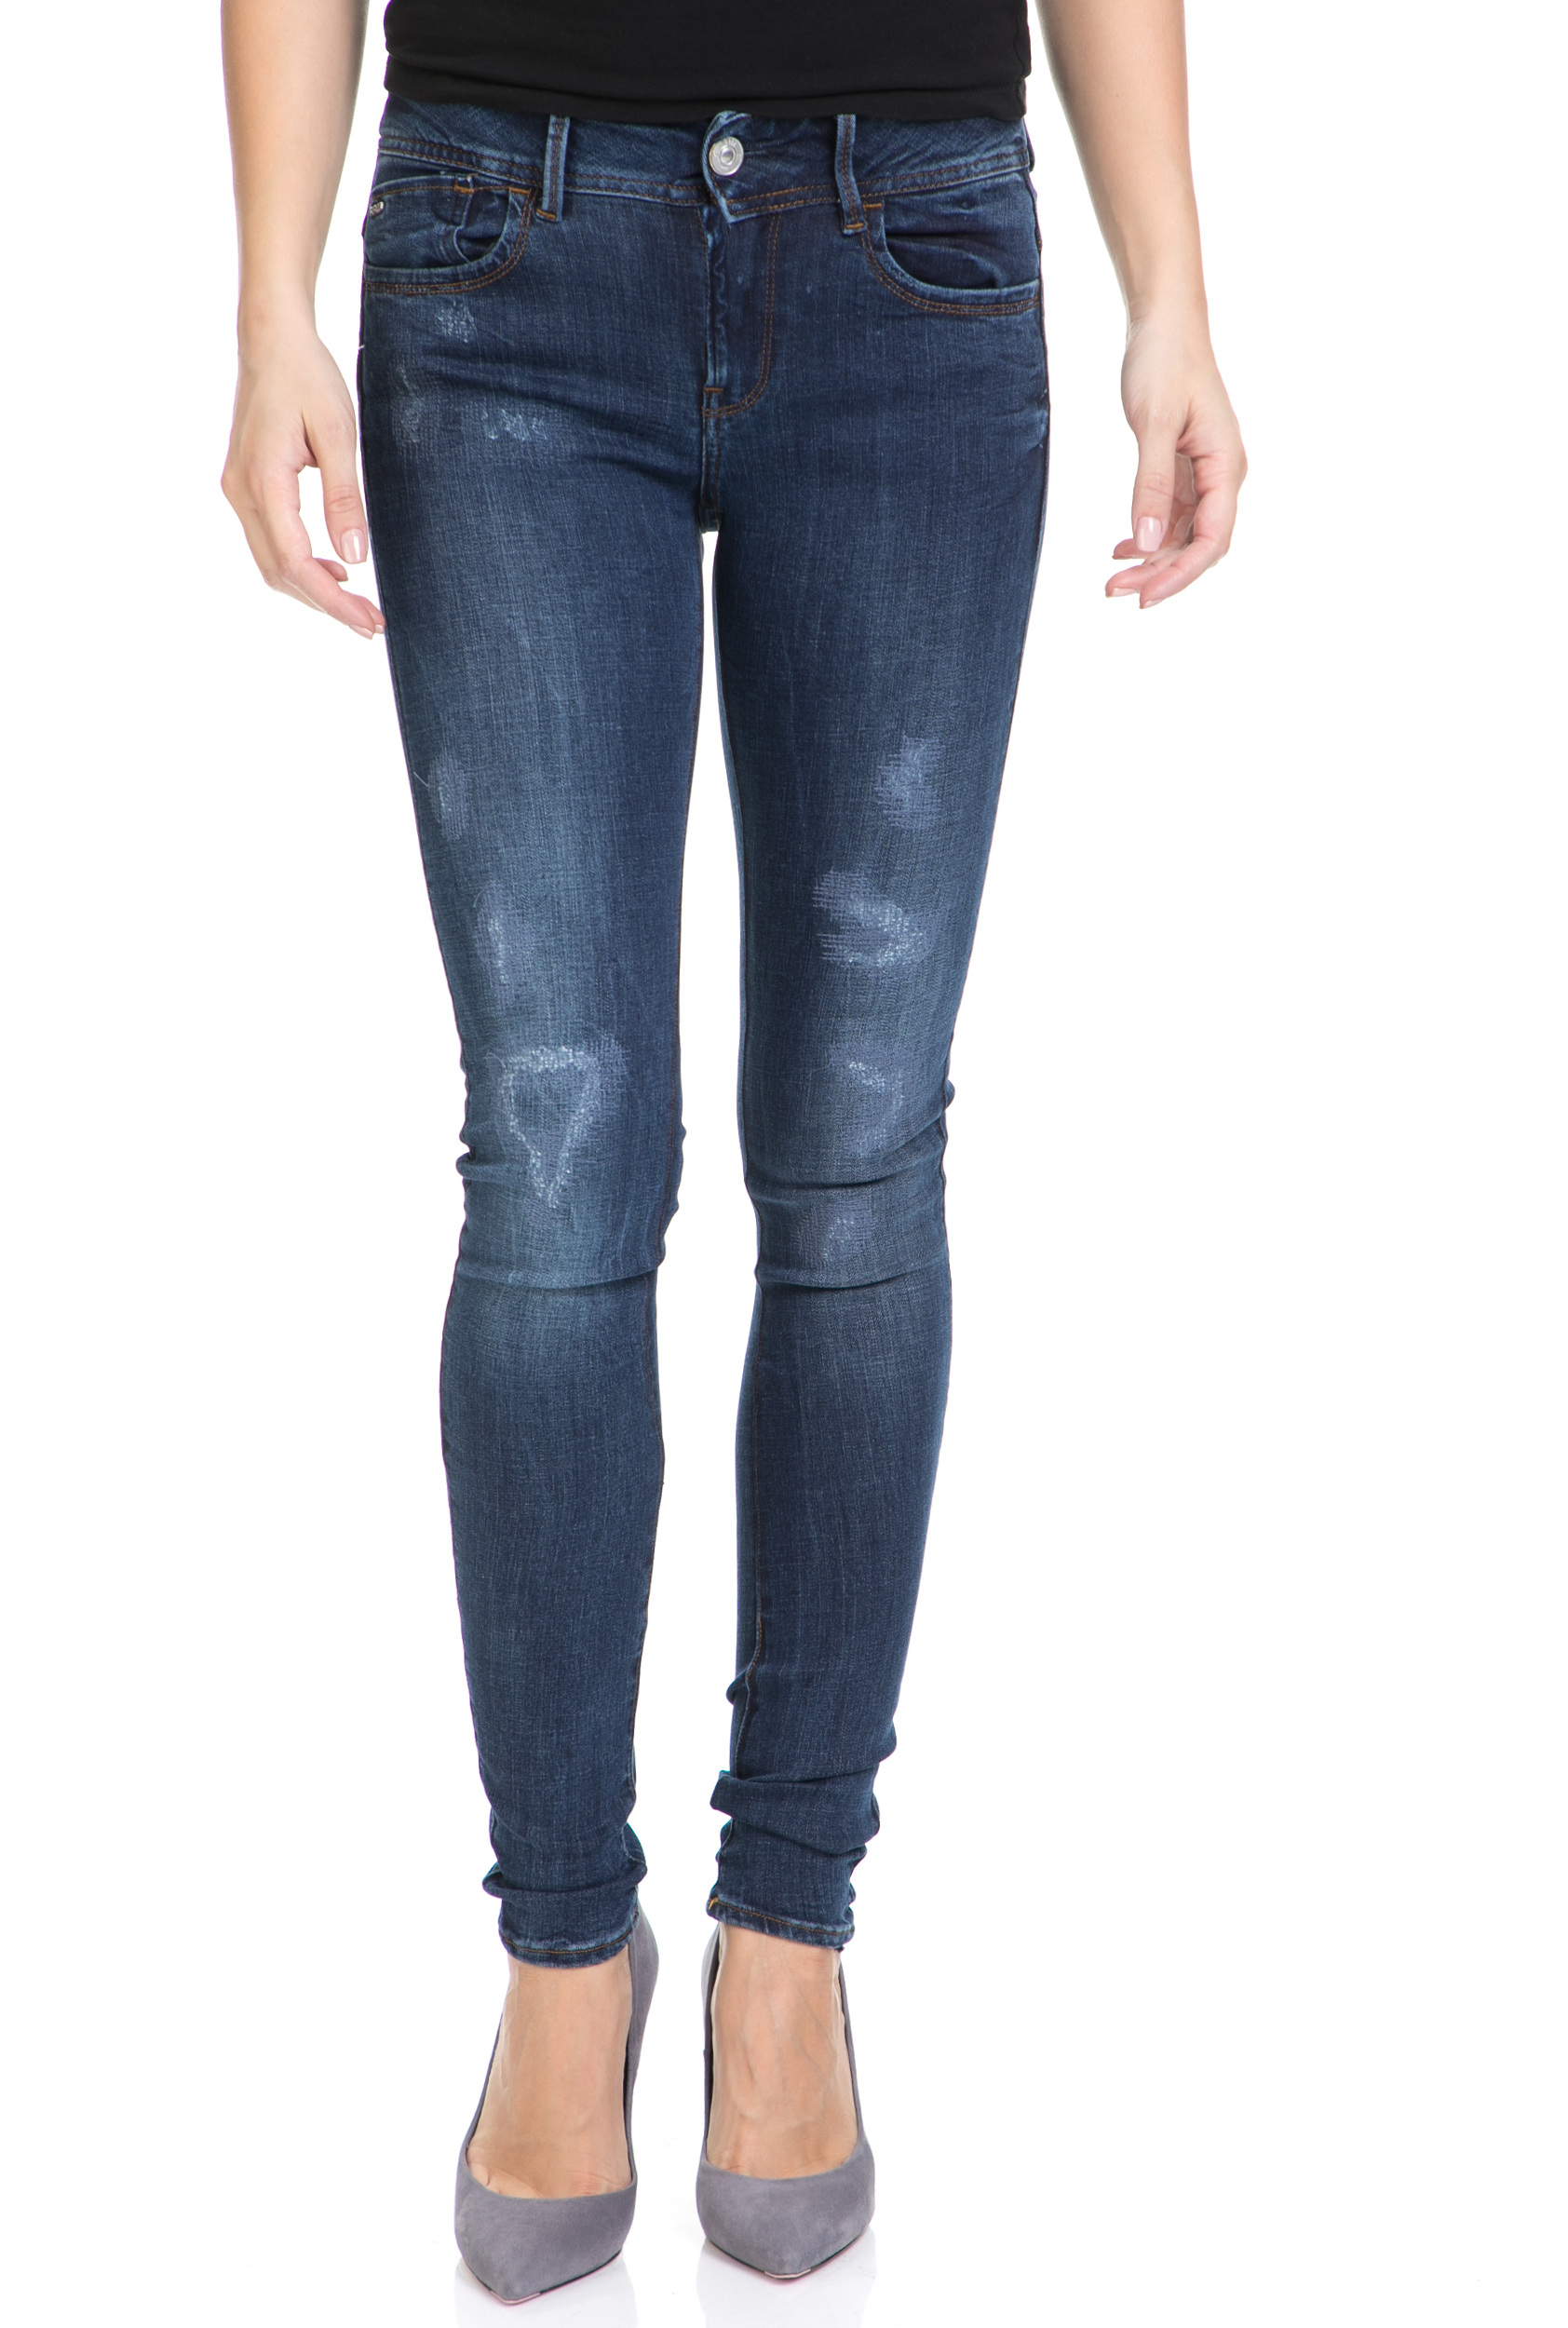 44c60cfe62 -56% G-STAR RAW – Γυναικείο τζιν παντελόνι LYNN D-MID SUPER SKINNY G-